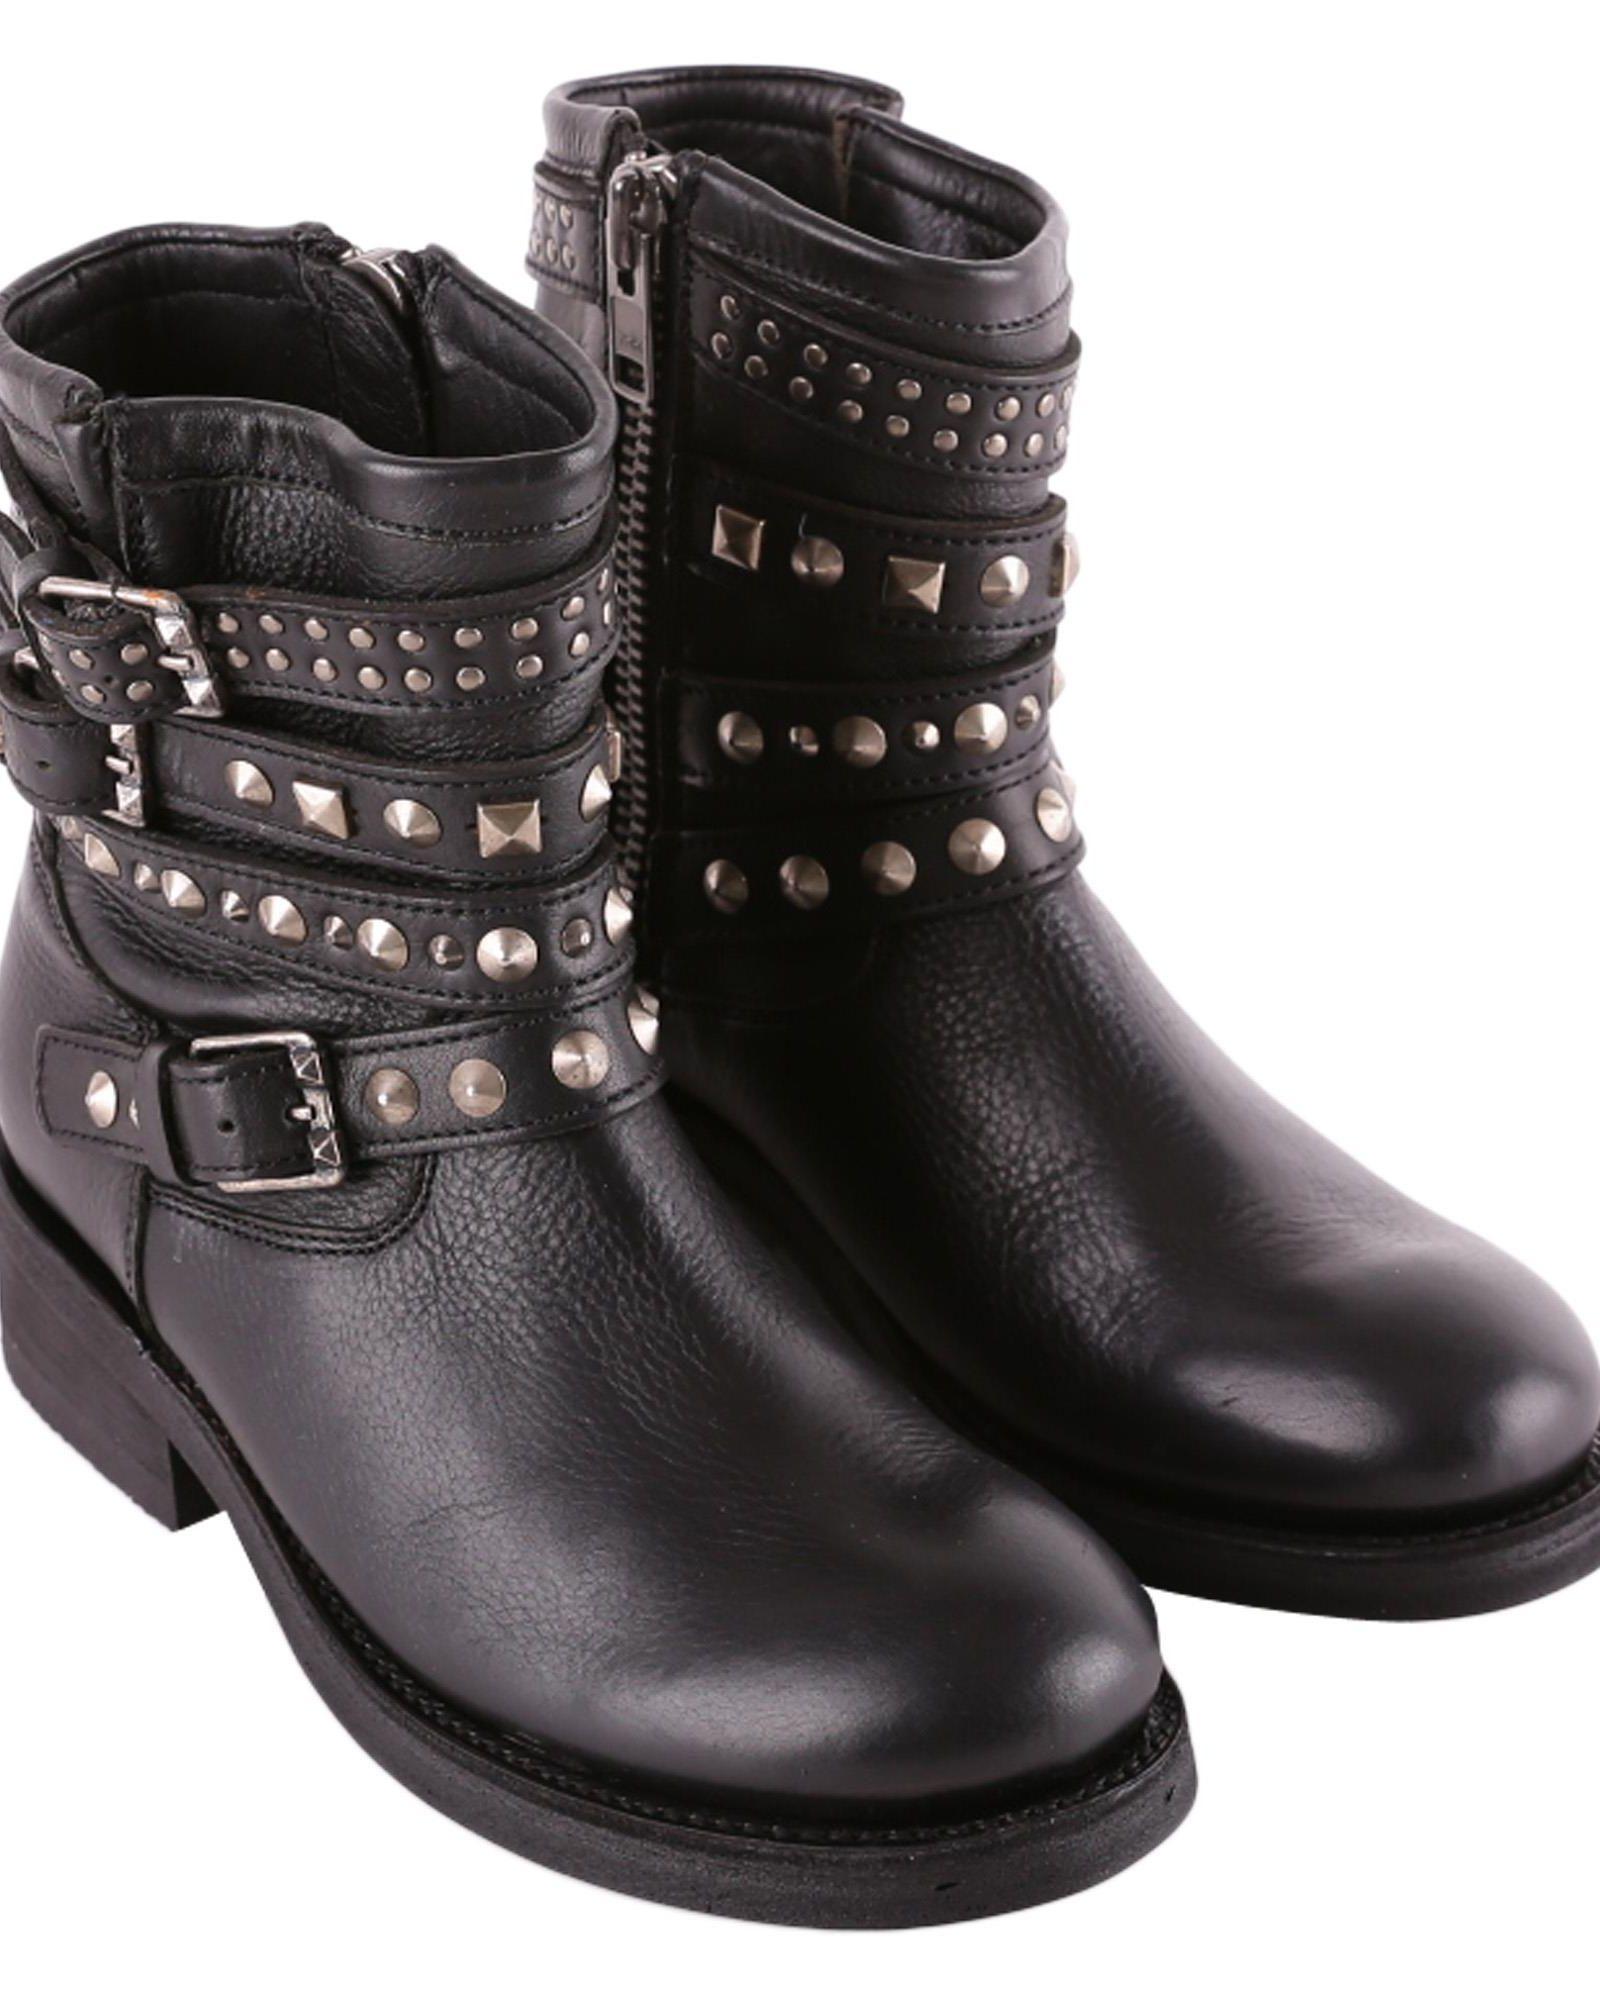 Ash Tatoo Leather Biker Boots in Black